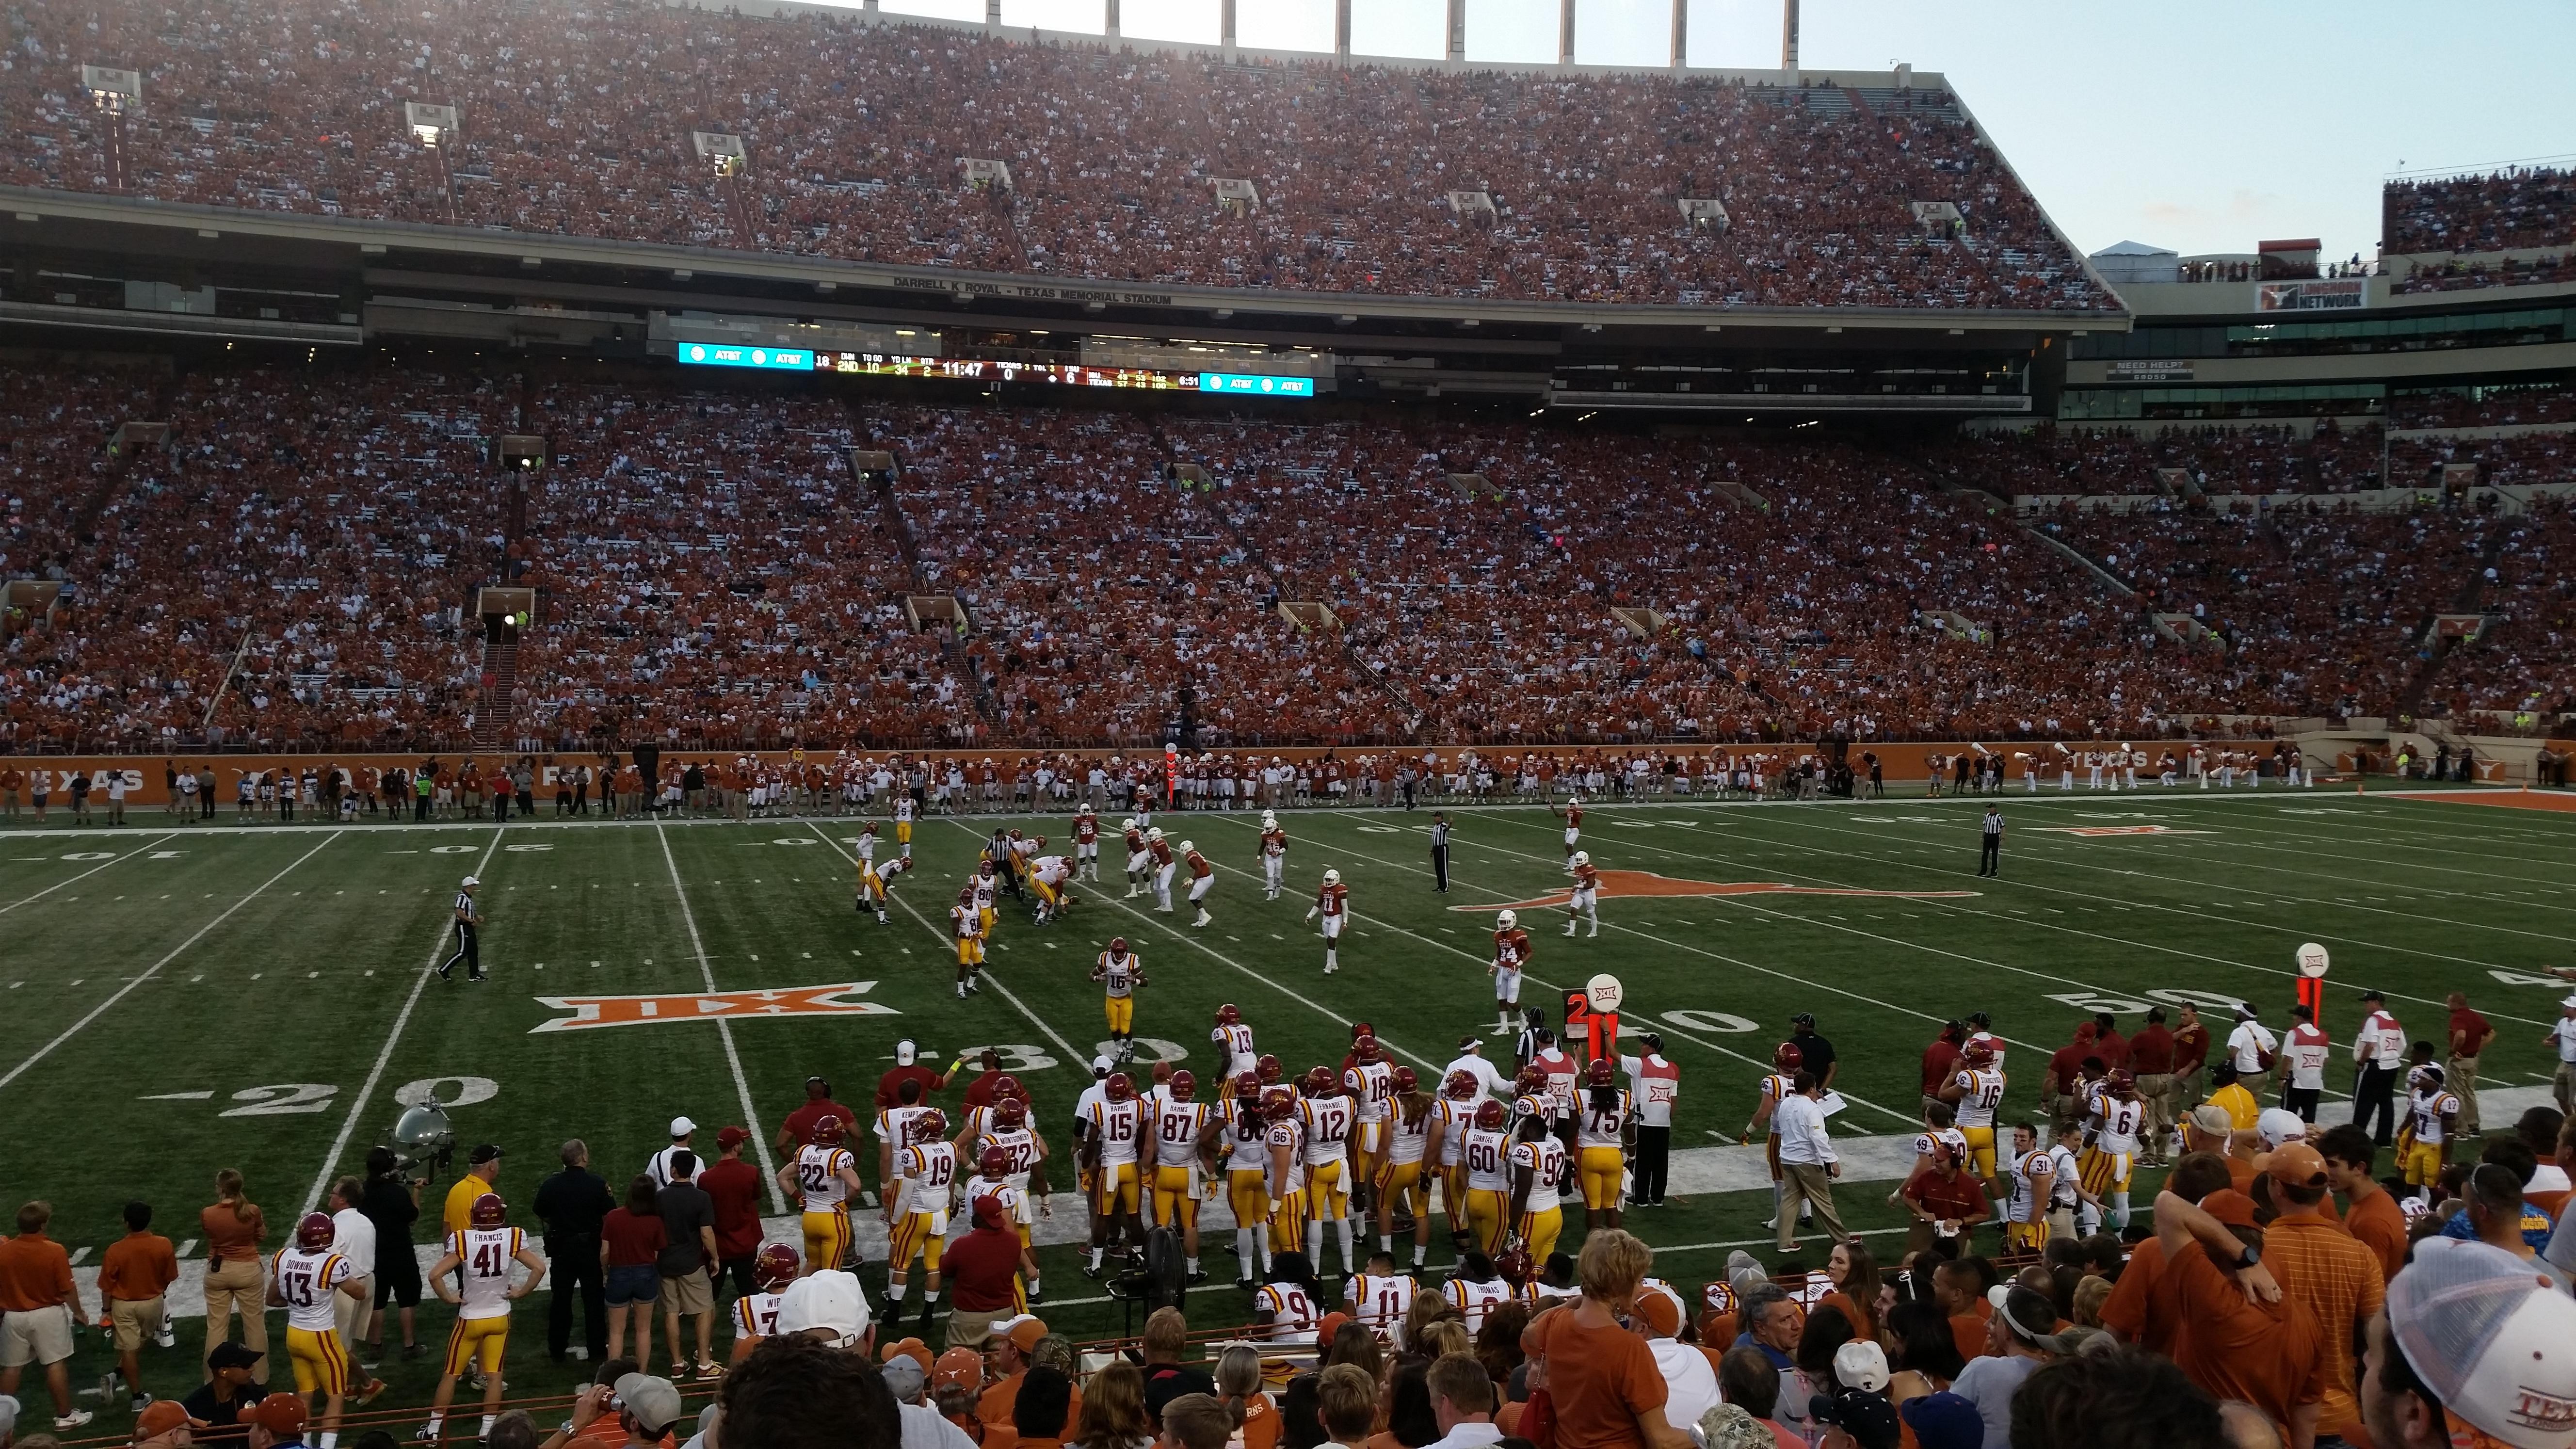 Texas Memorial Stadium Section 30 Row 14 Seat 9